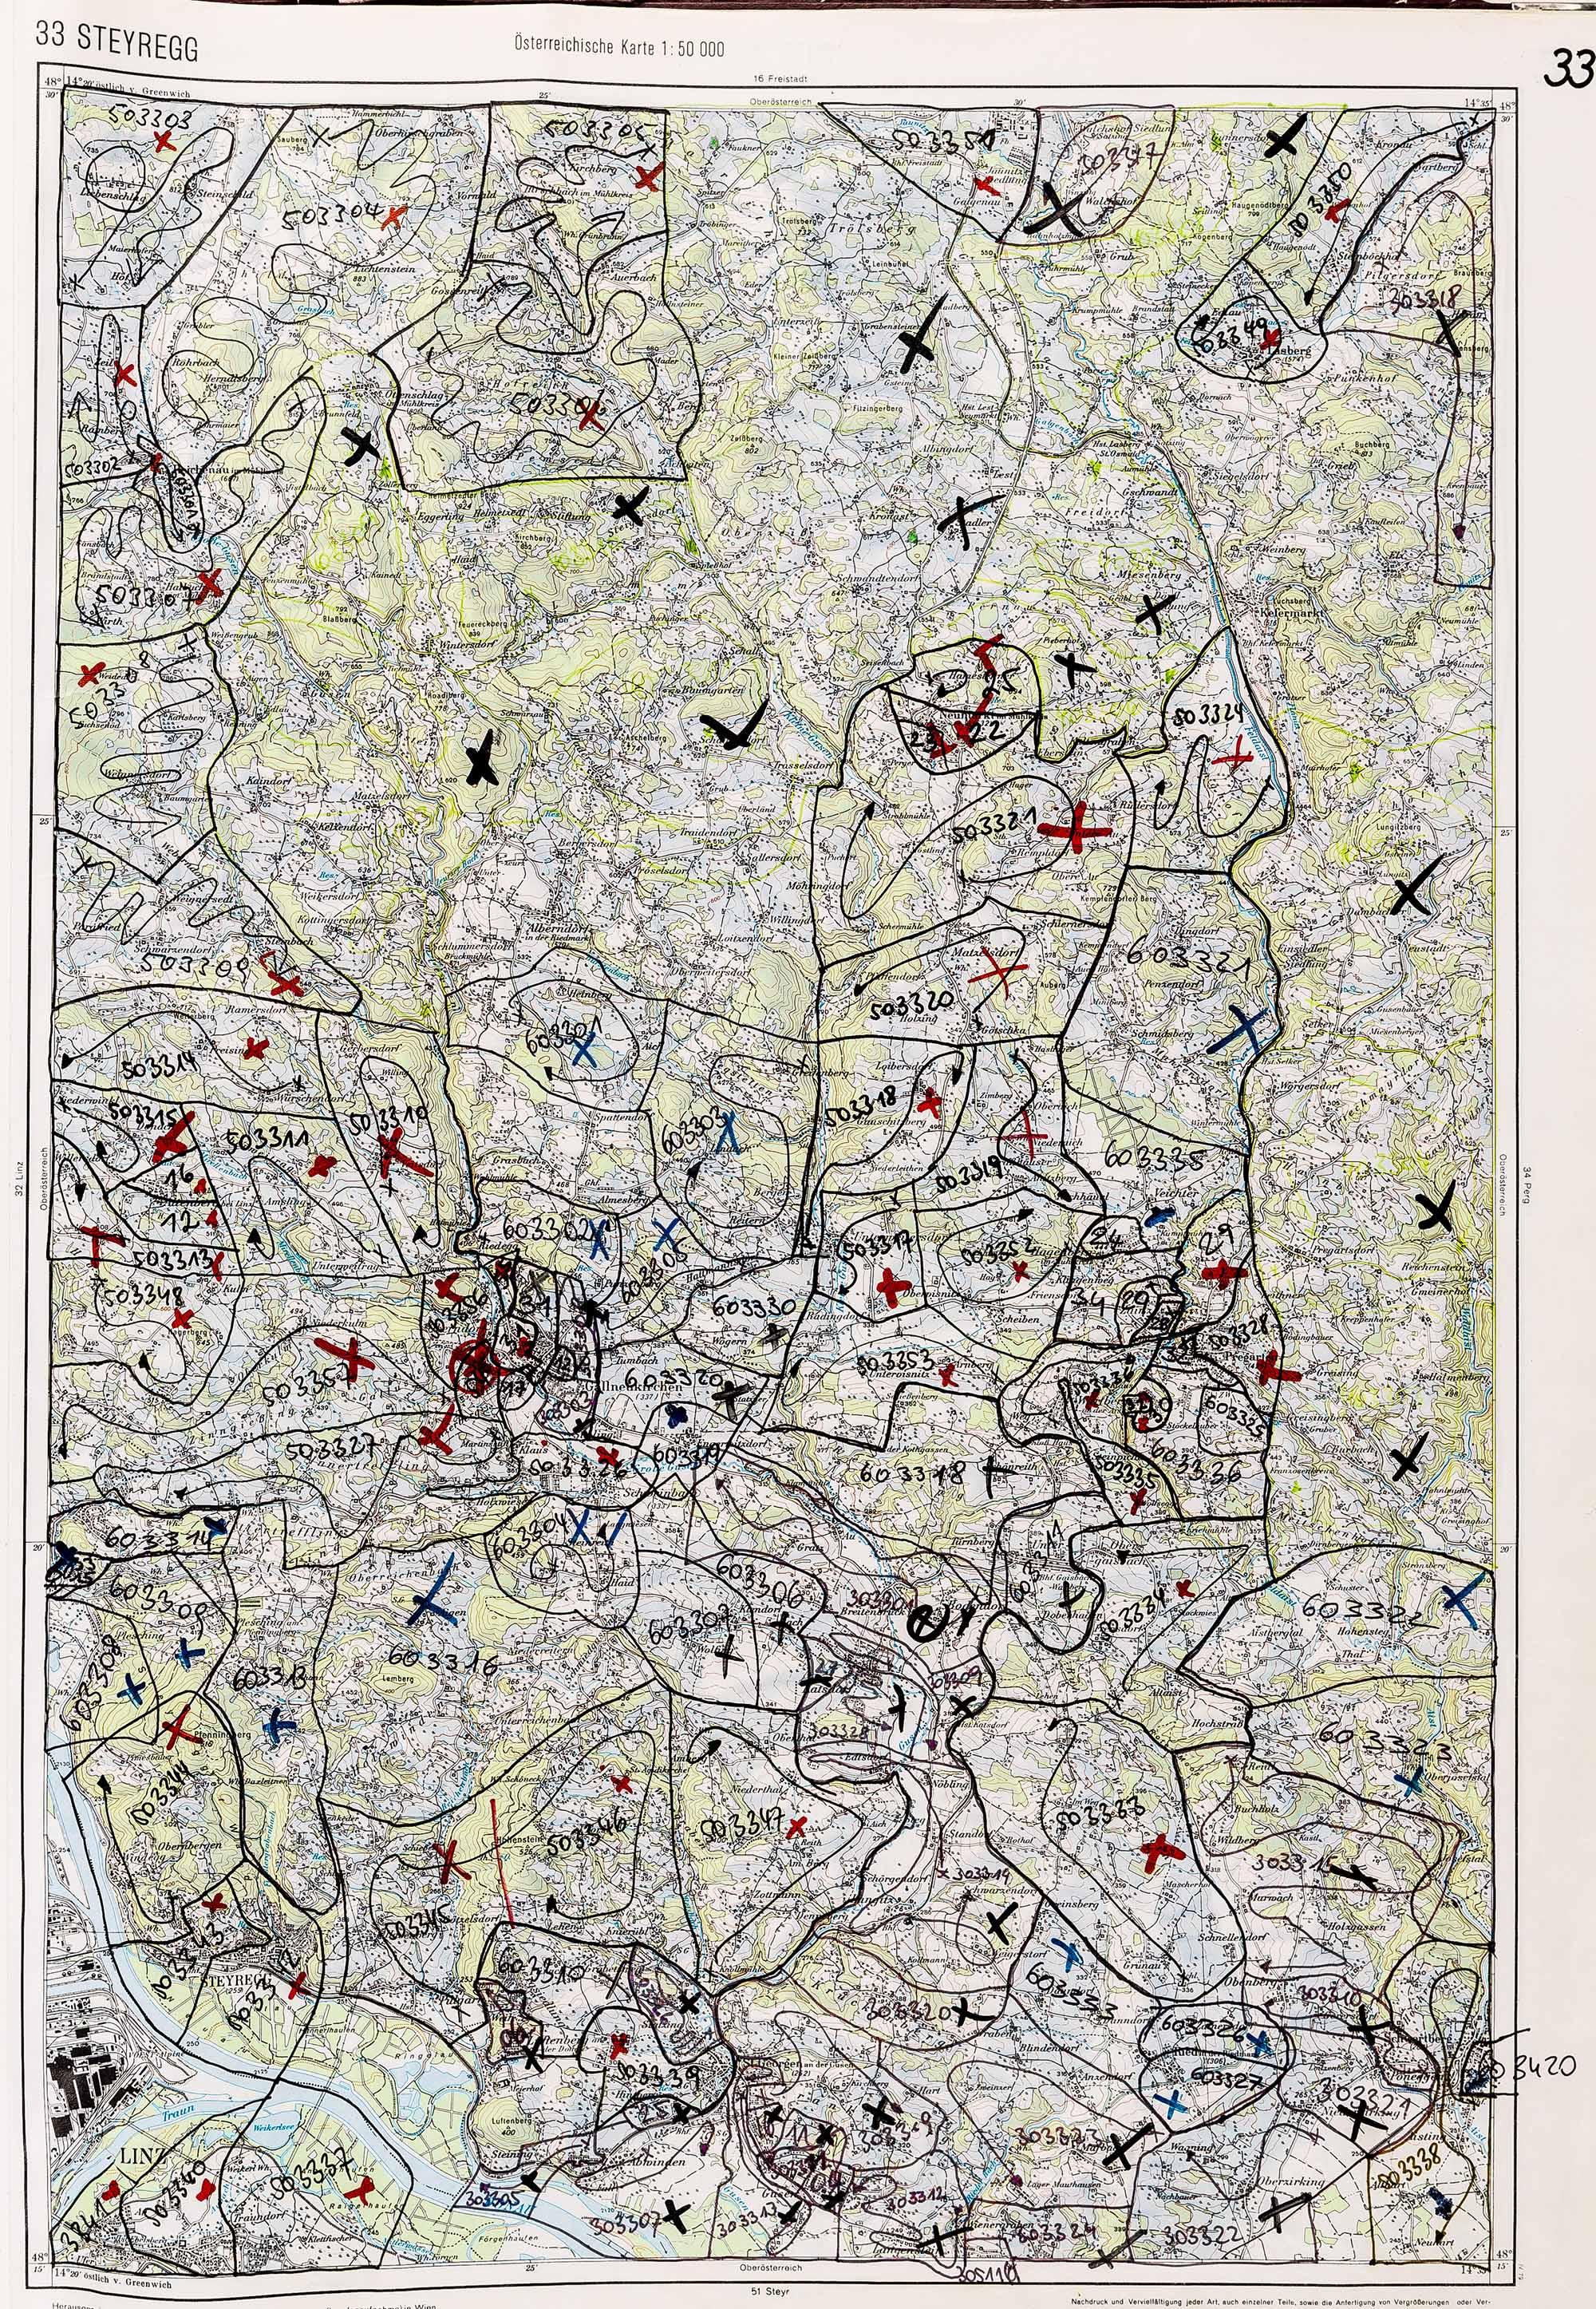 1983-1986 Karte 033